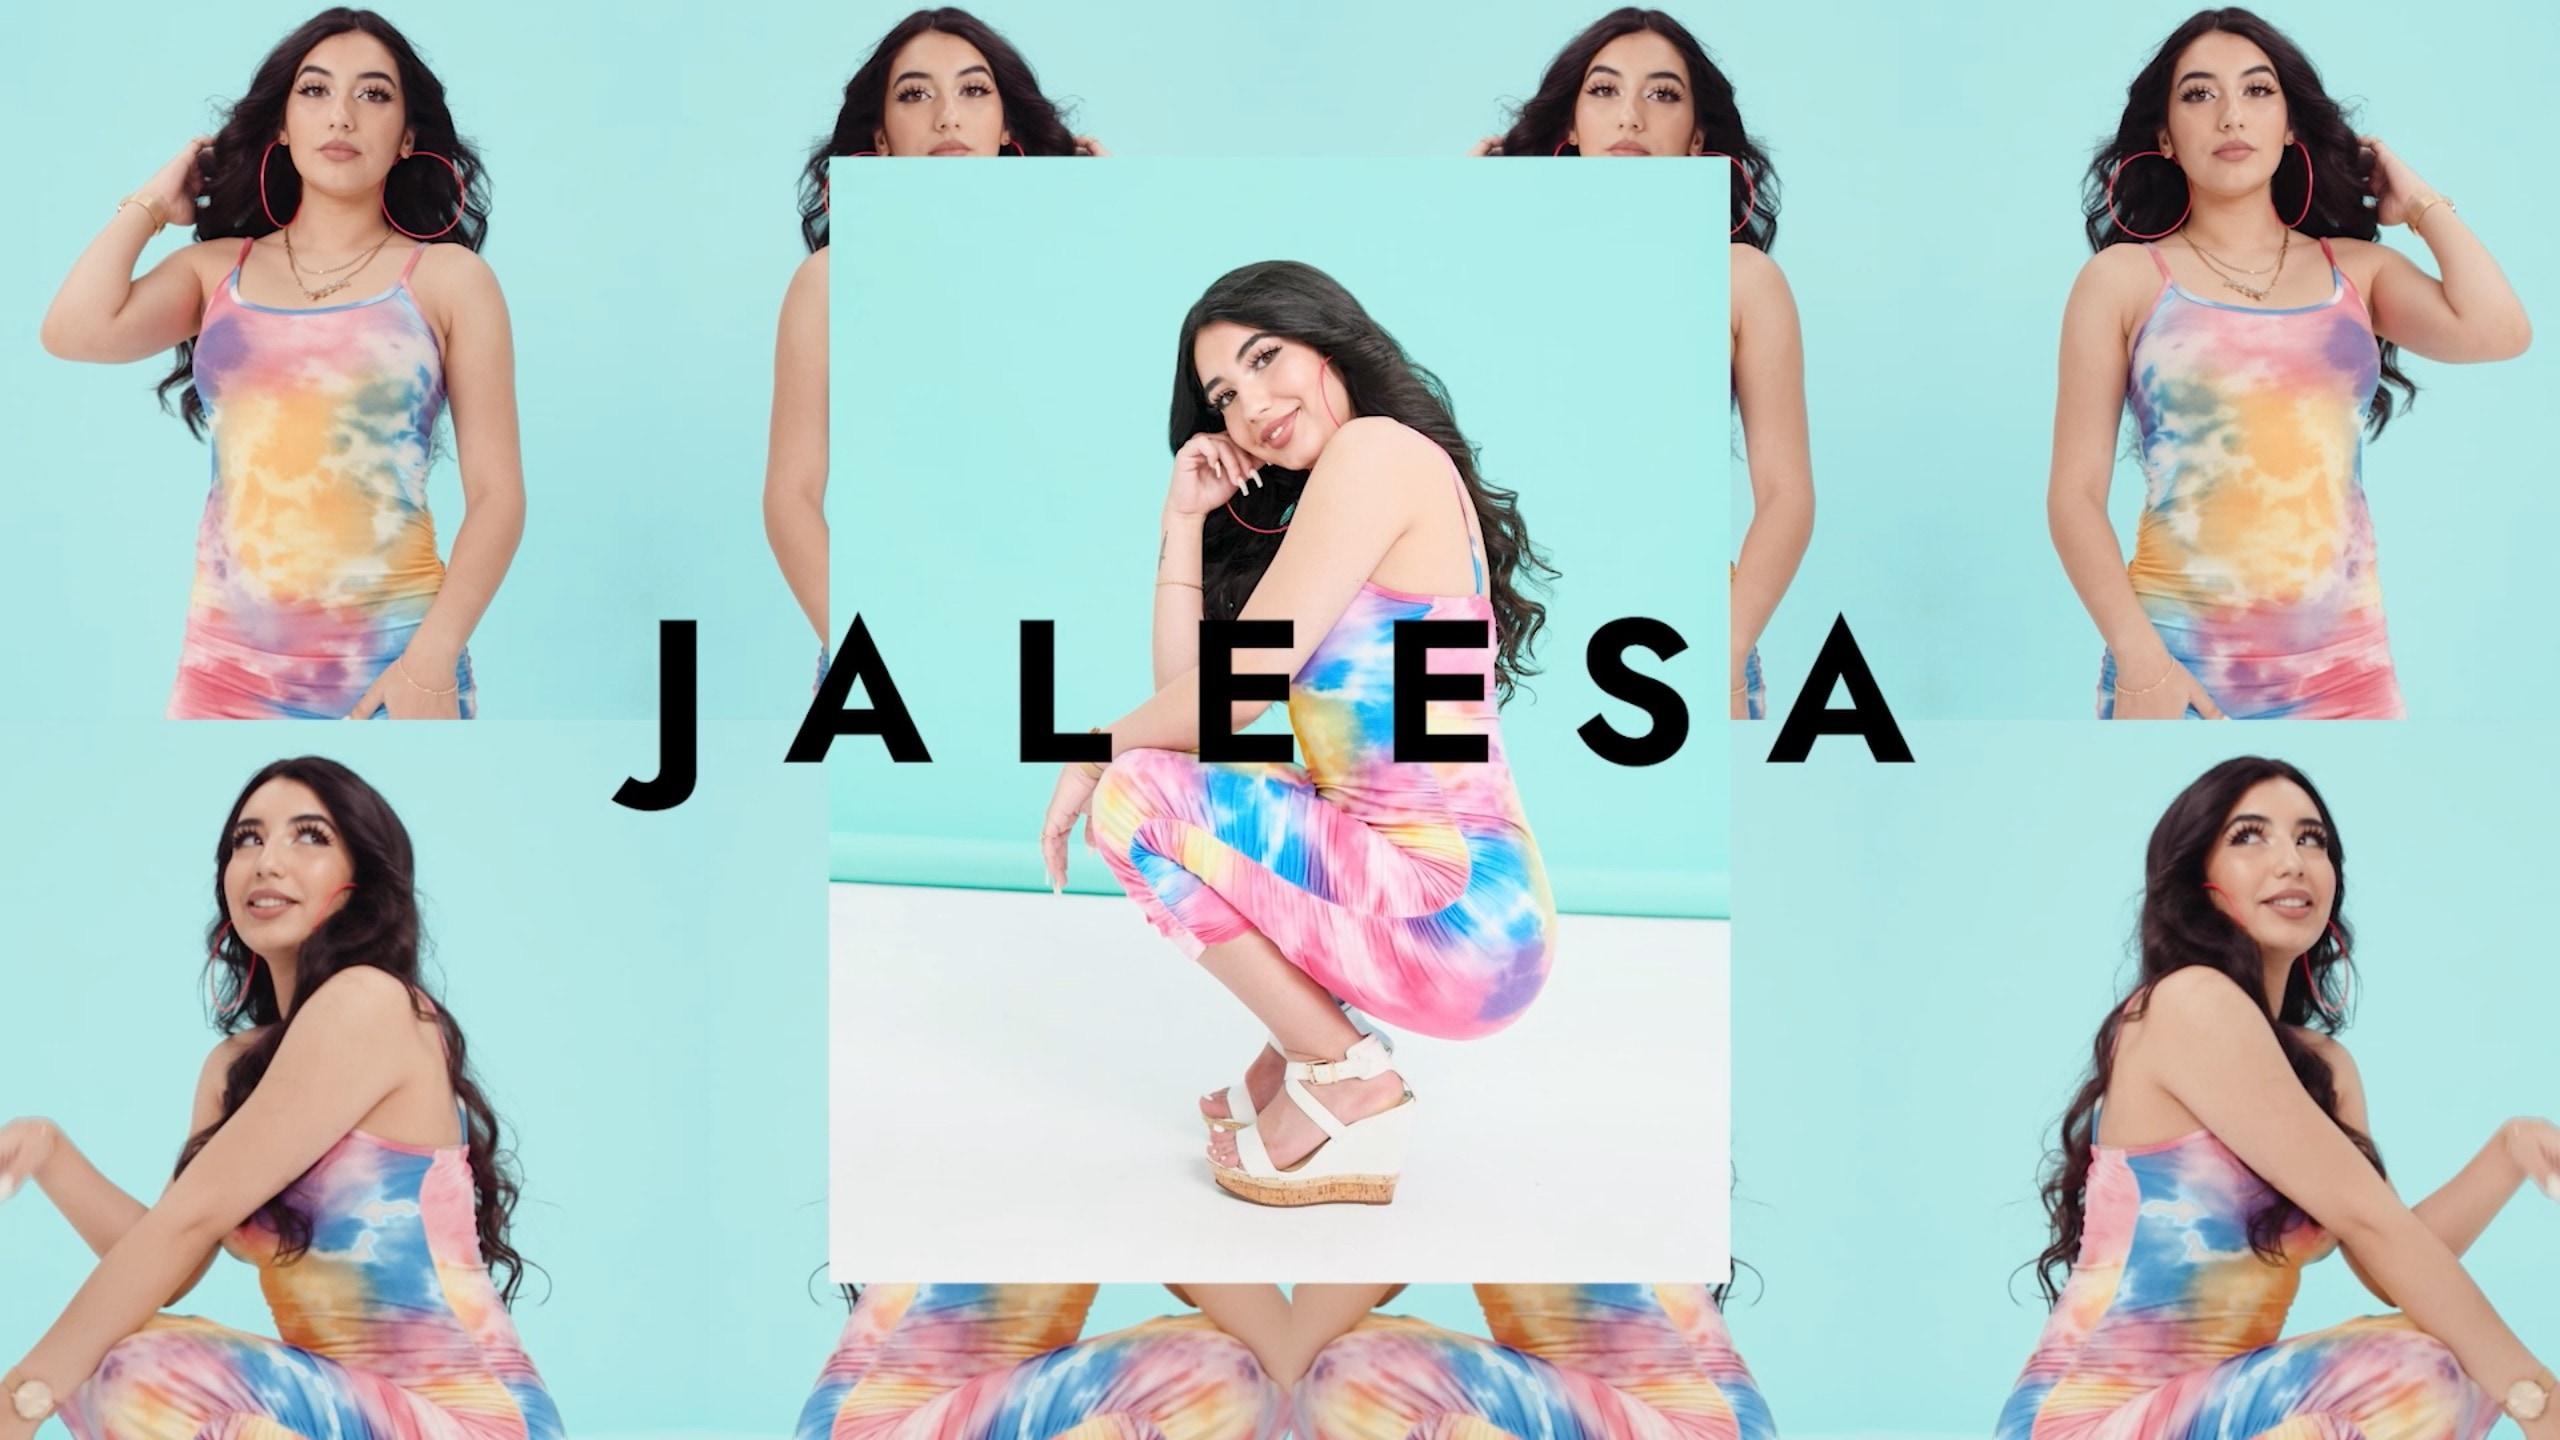 Watch Jaleesa discuss Hispanic Heritage Month